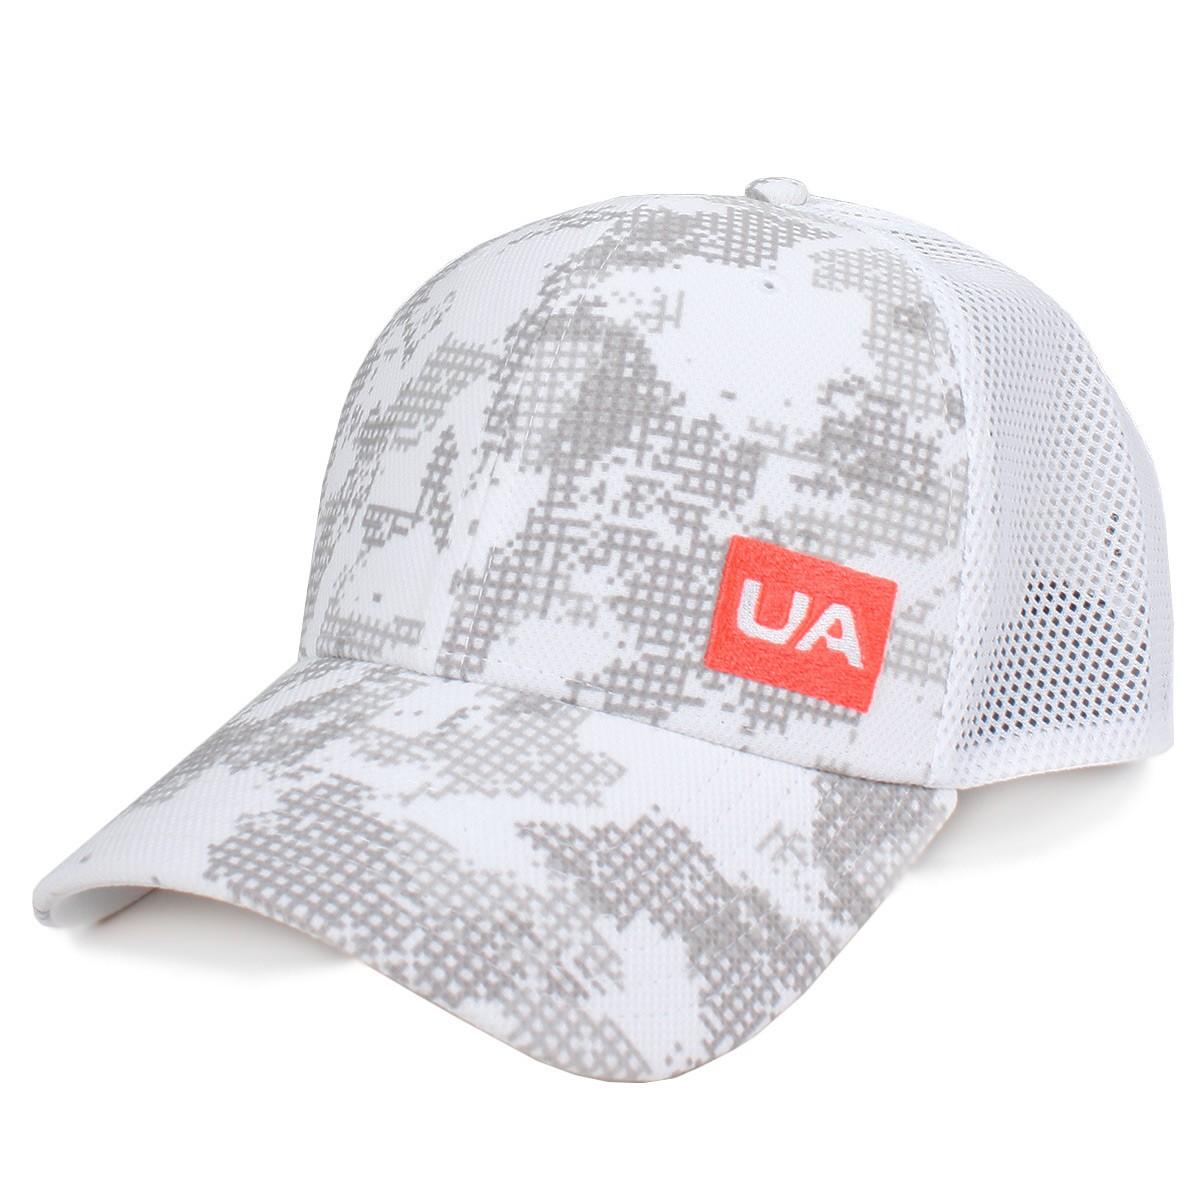 Under Armour Mens Blitzing Trucker 3.0 Golf Cap - Golf Headwear ... 3bc2bb23ed67